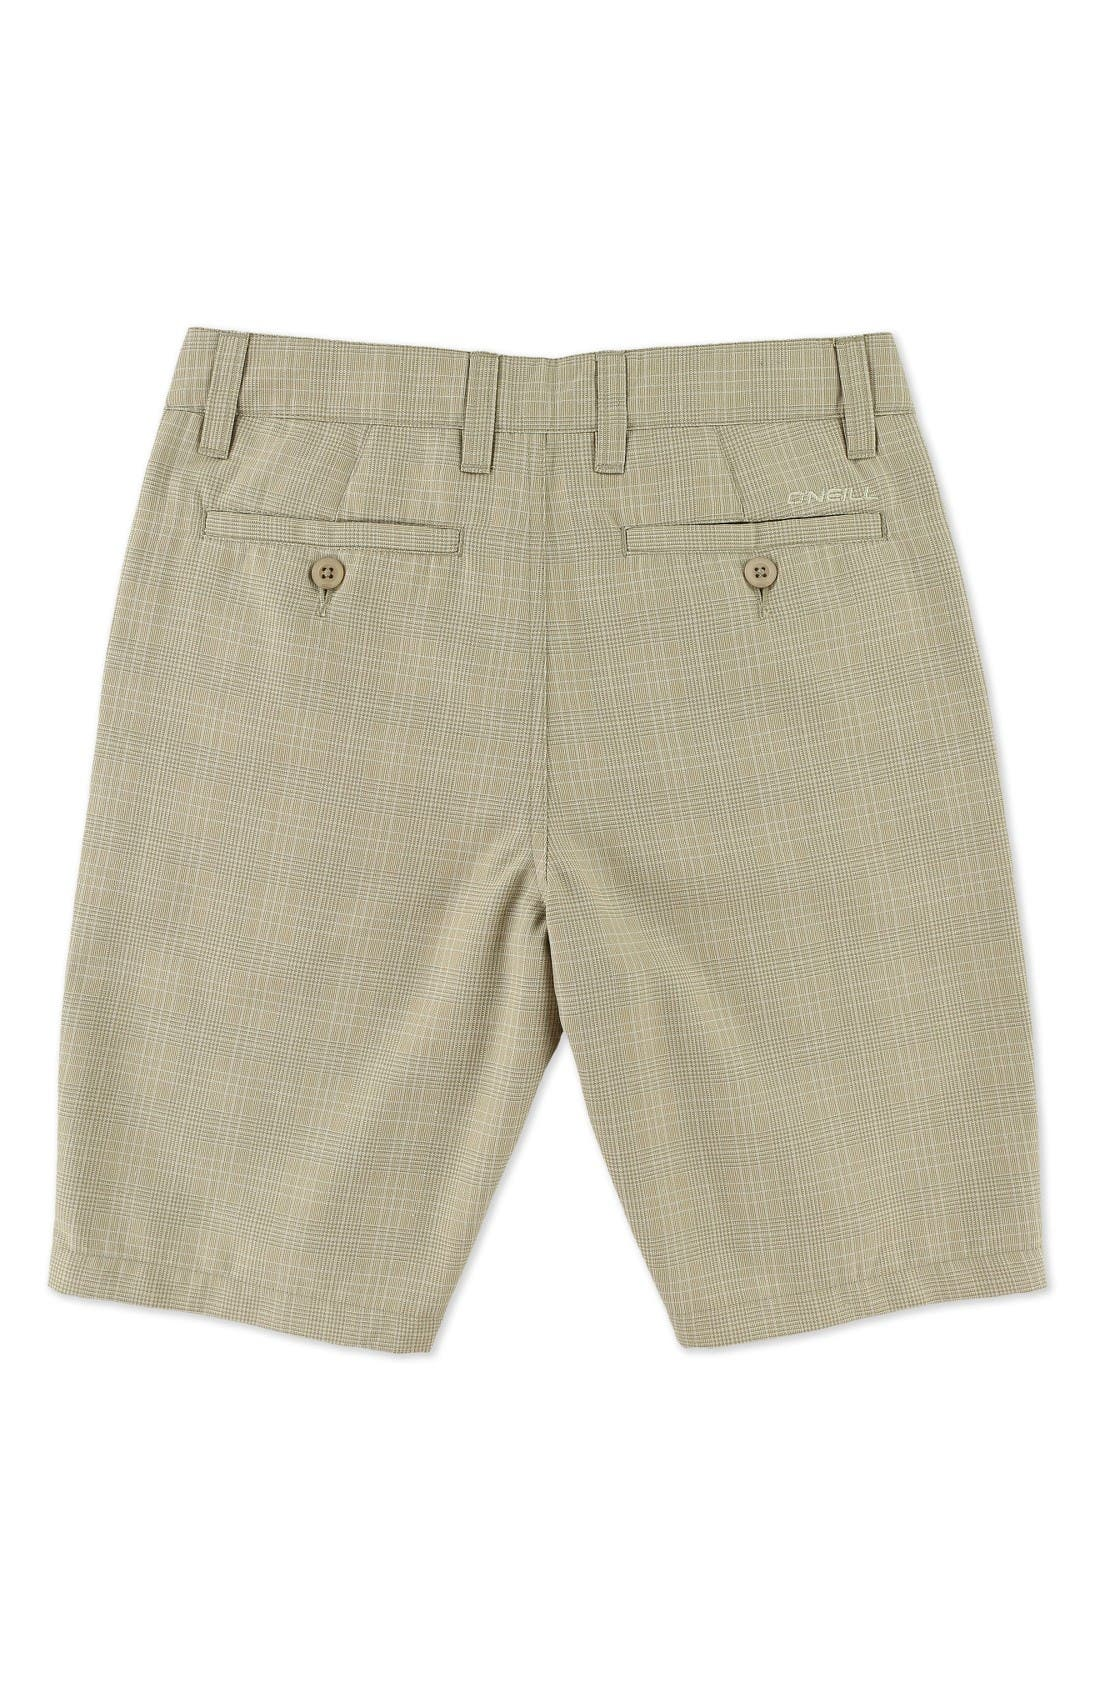 Delta Plaid Chino Shorts,                             Alternate thumbnail 2, color,                             Dark Stone